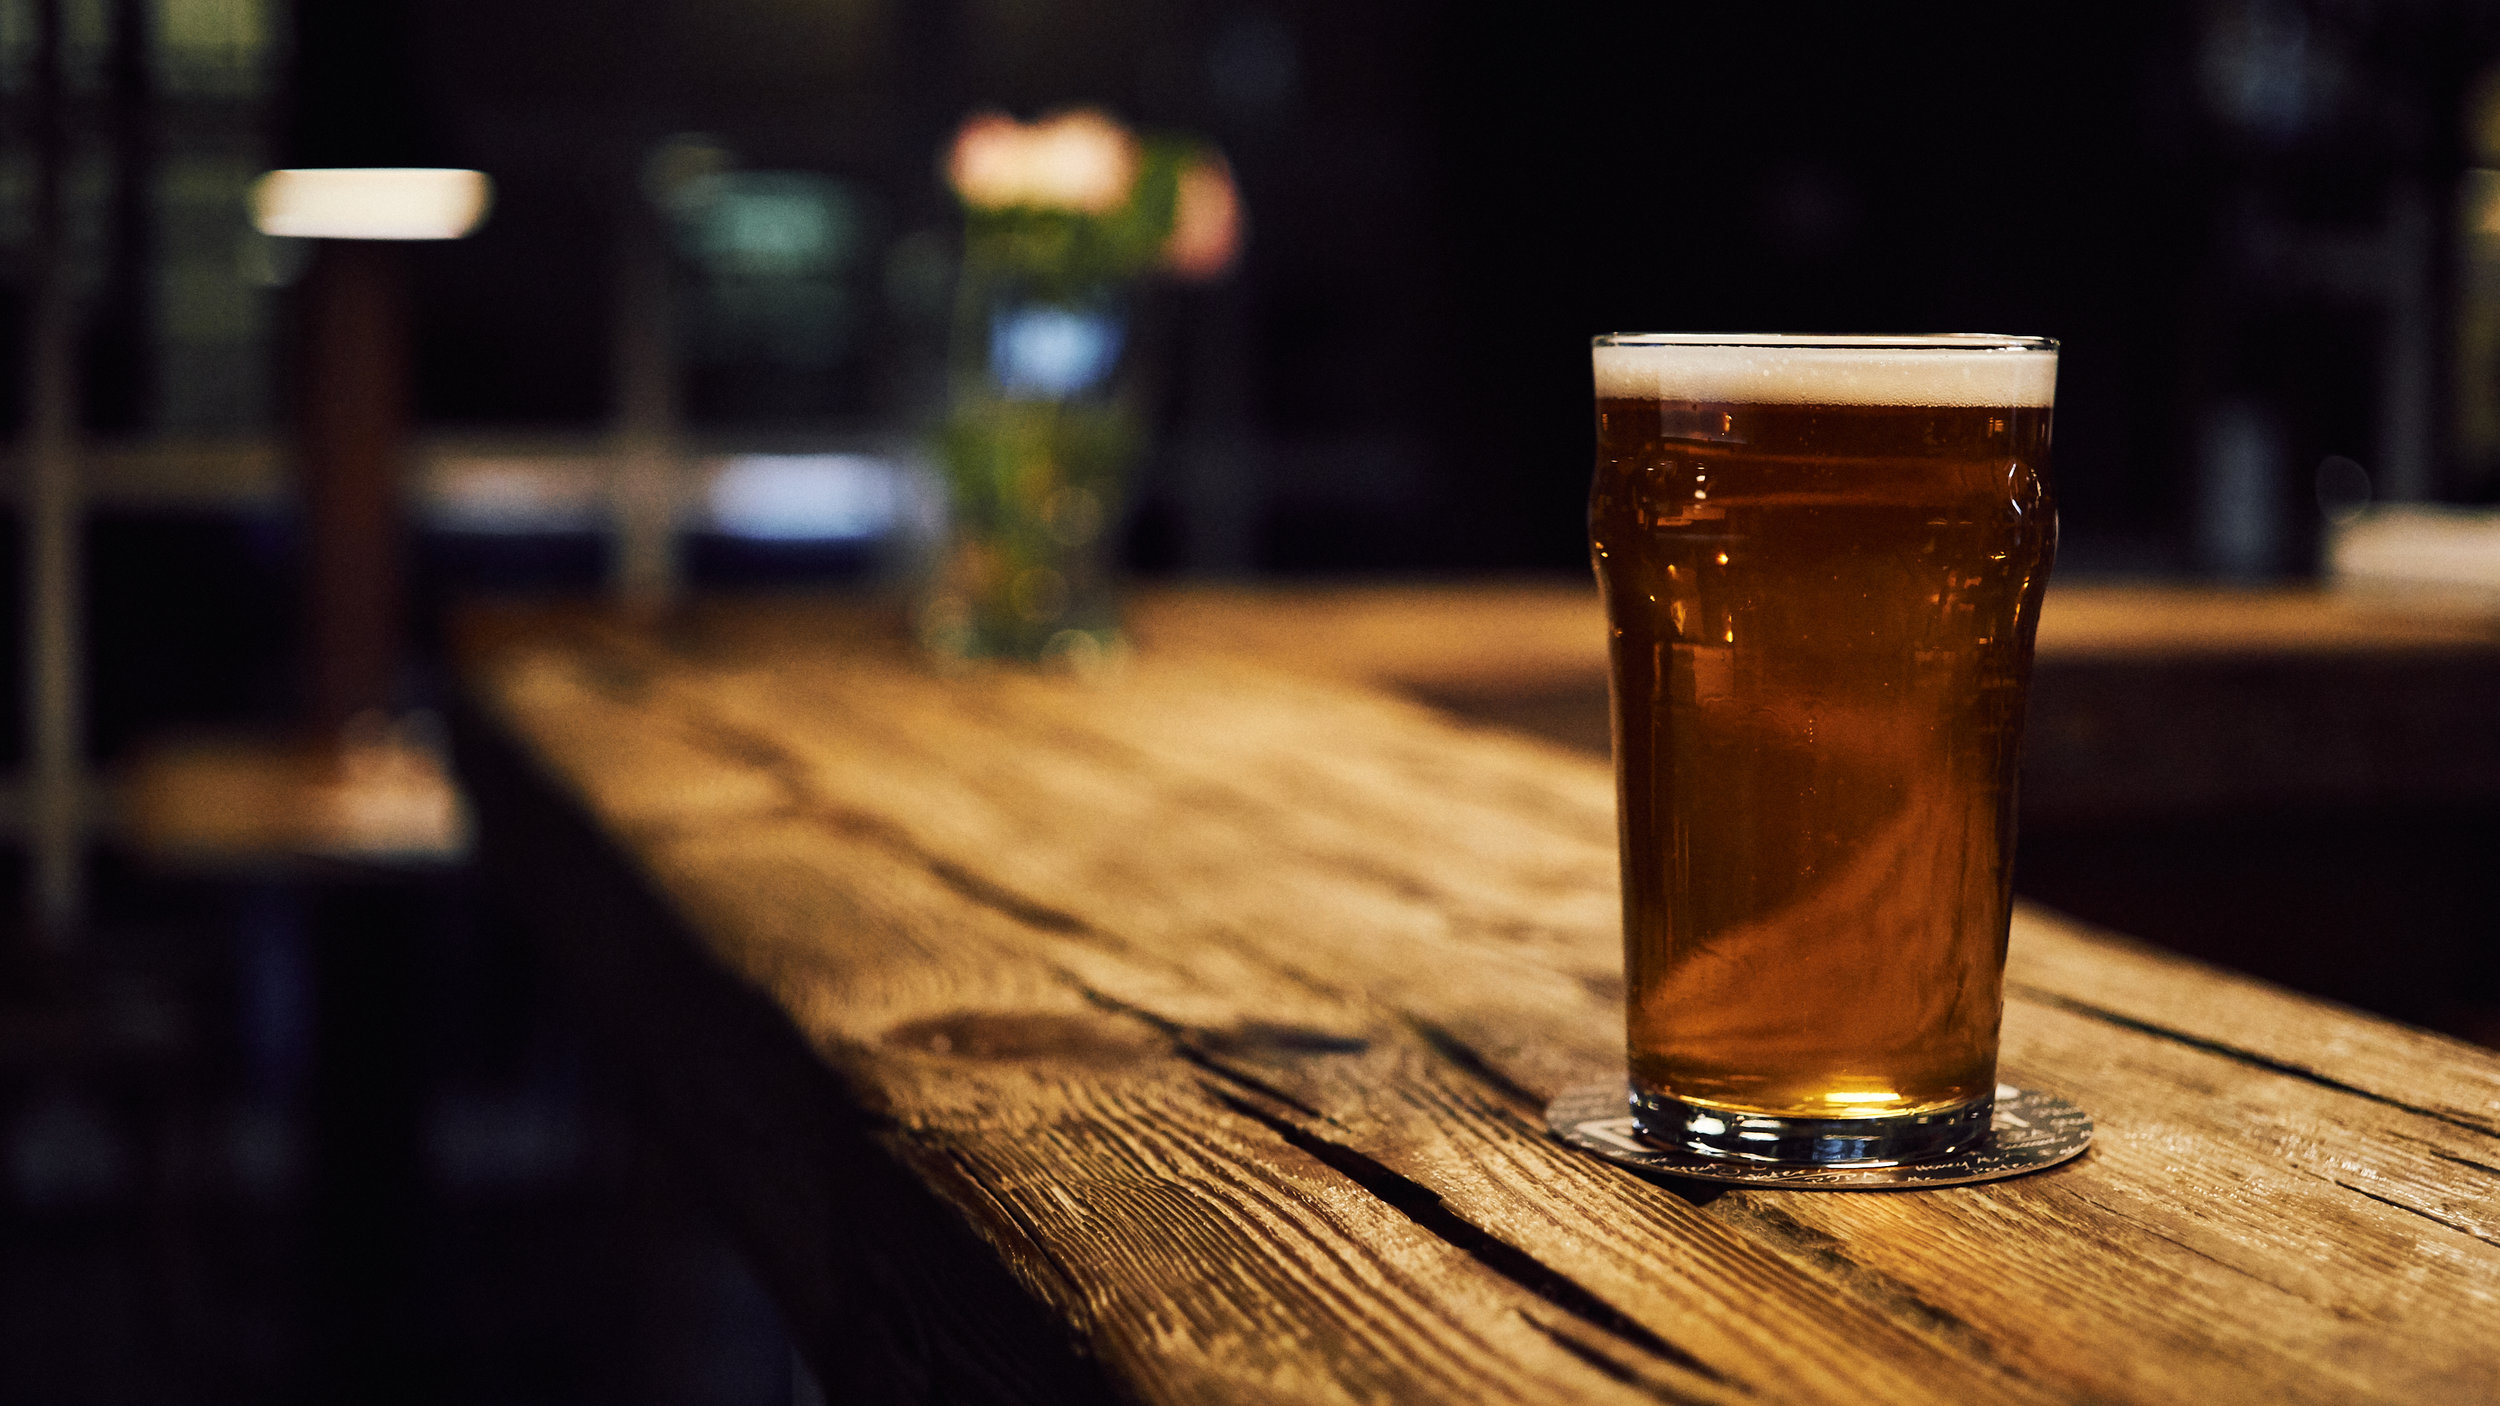 They're not just bars, they're destinations - Monkey Barrel・Beer Barrel・Rusty Barrel